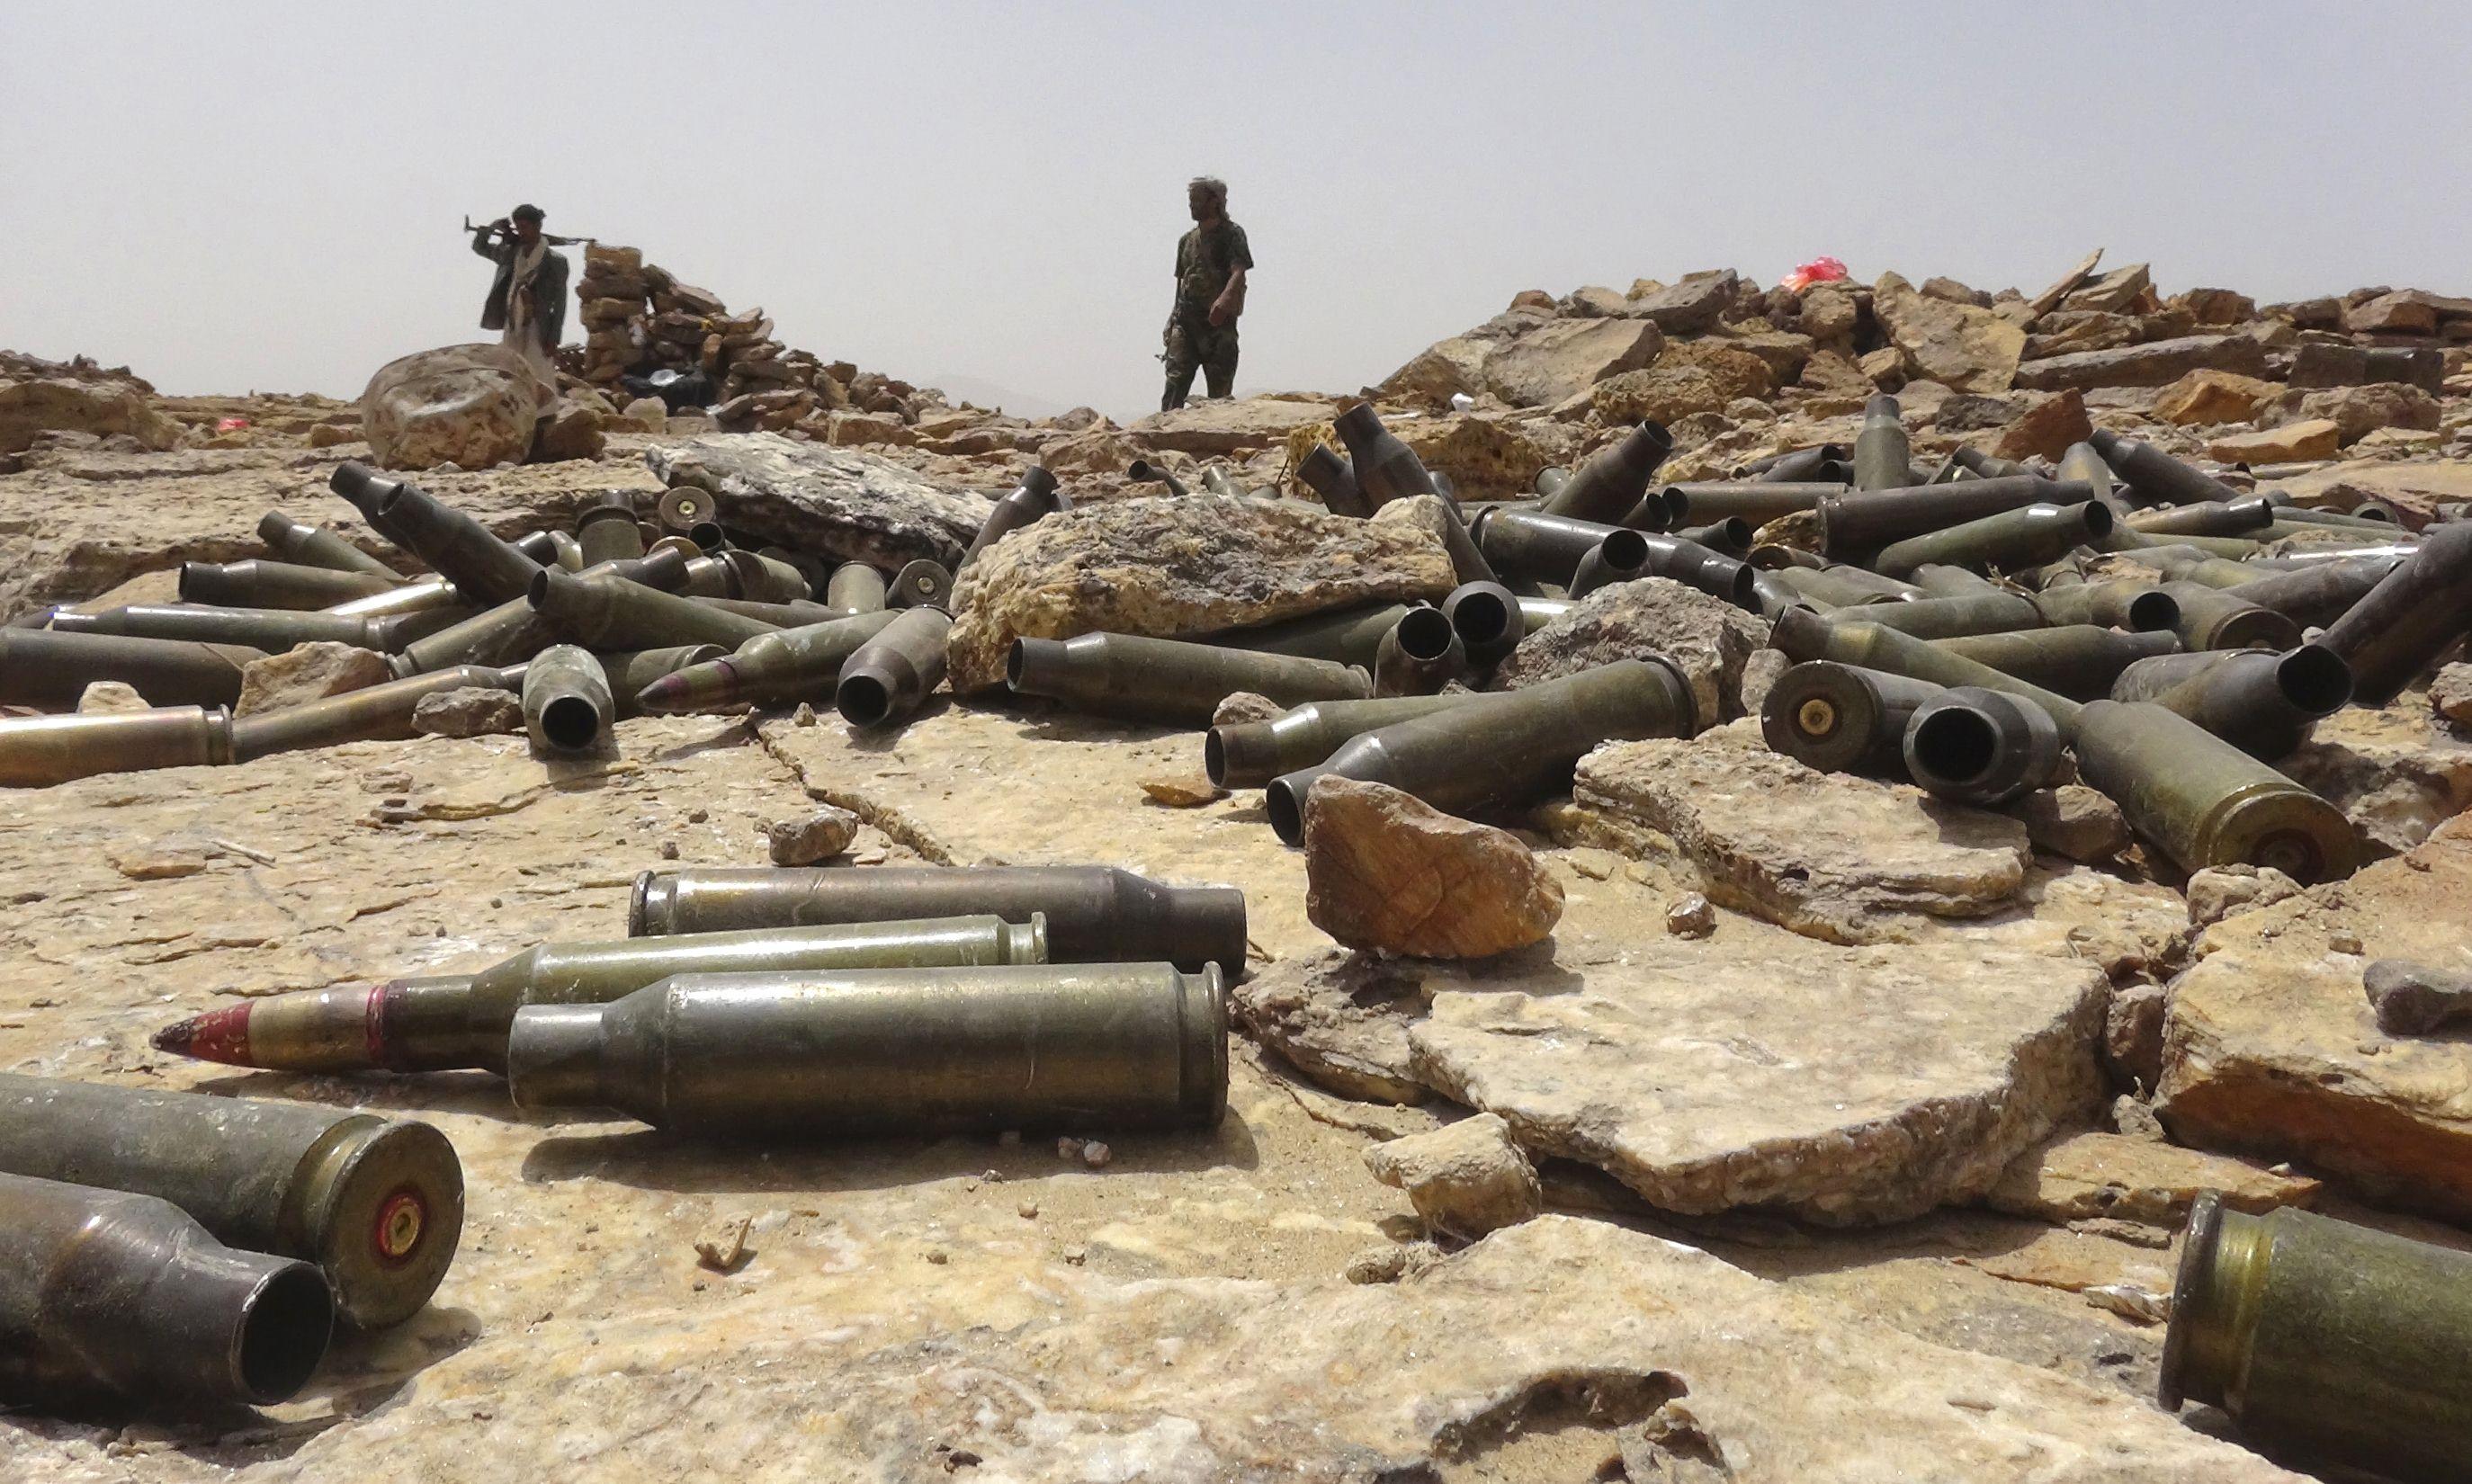 Yemen resistance